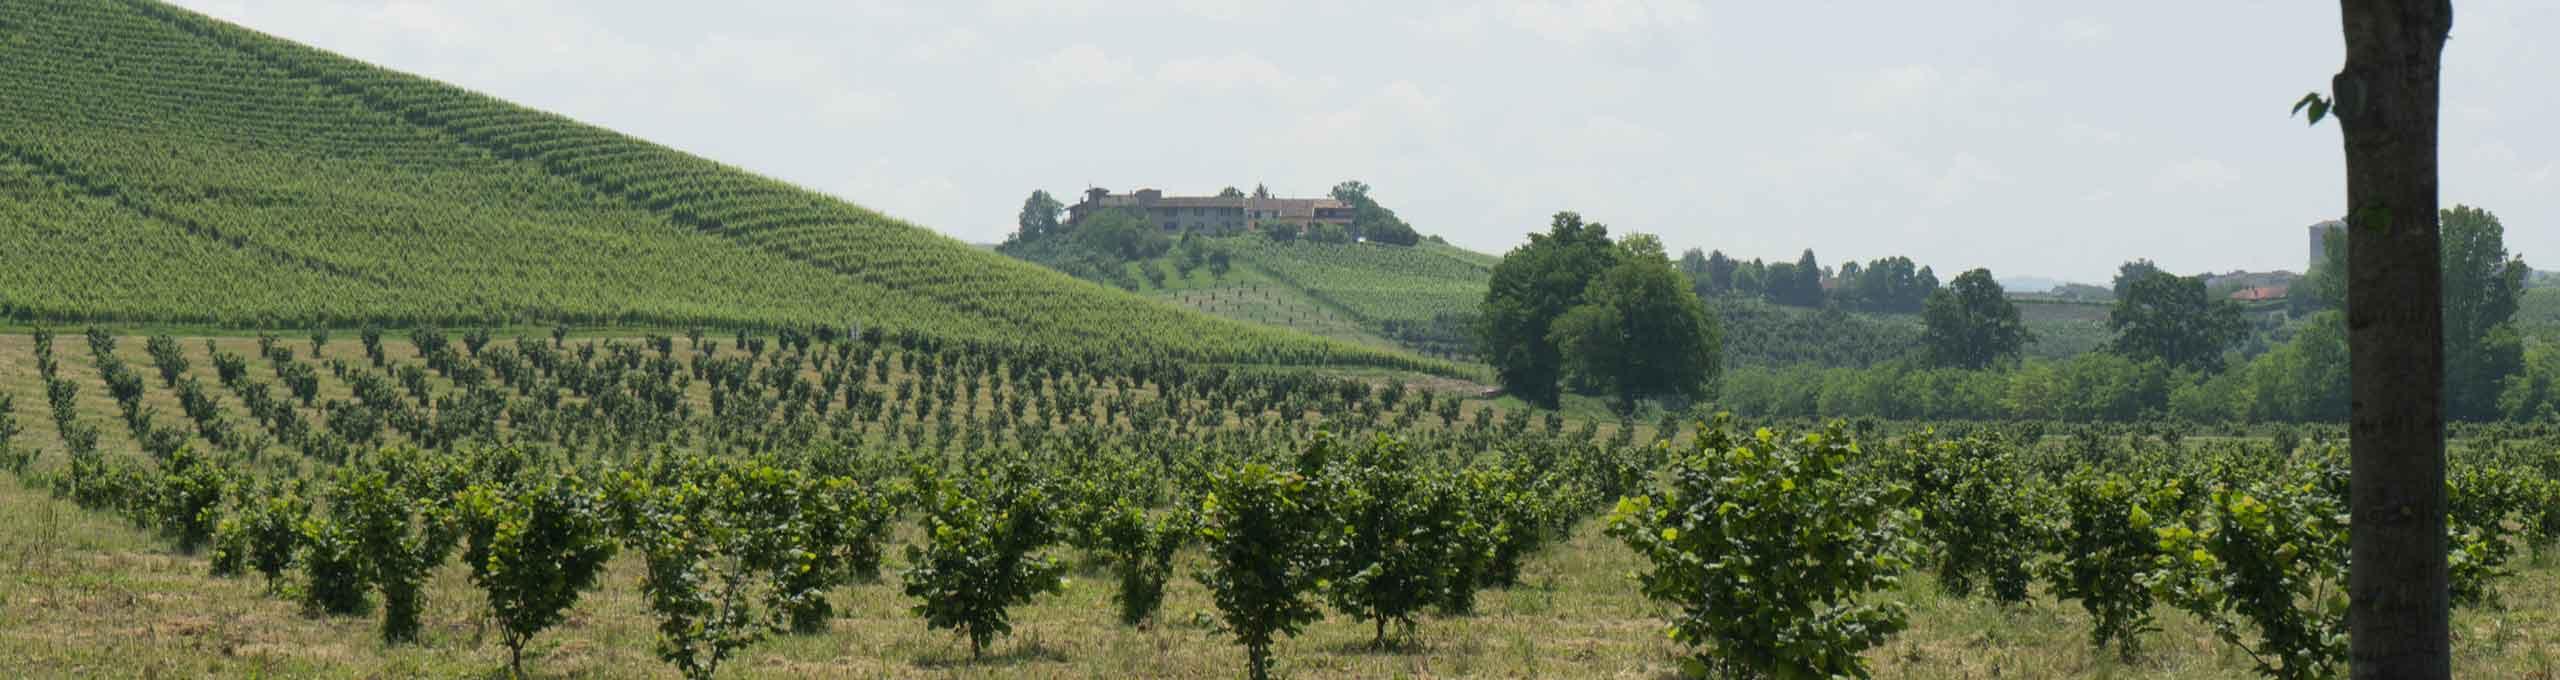 Castelletto Uzzone, Valli Bormida e Uzzone